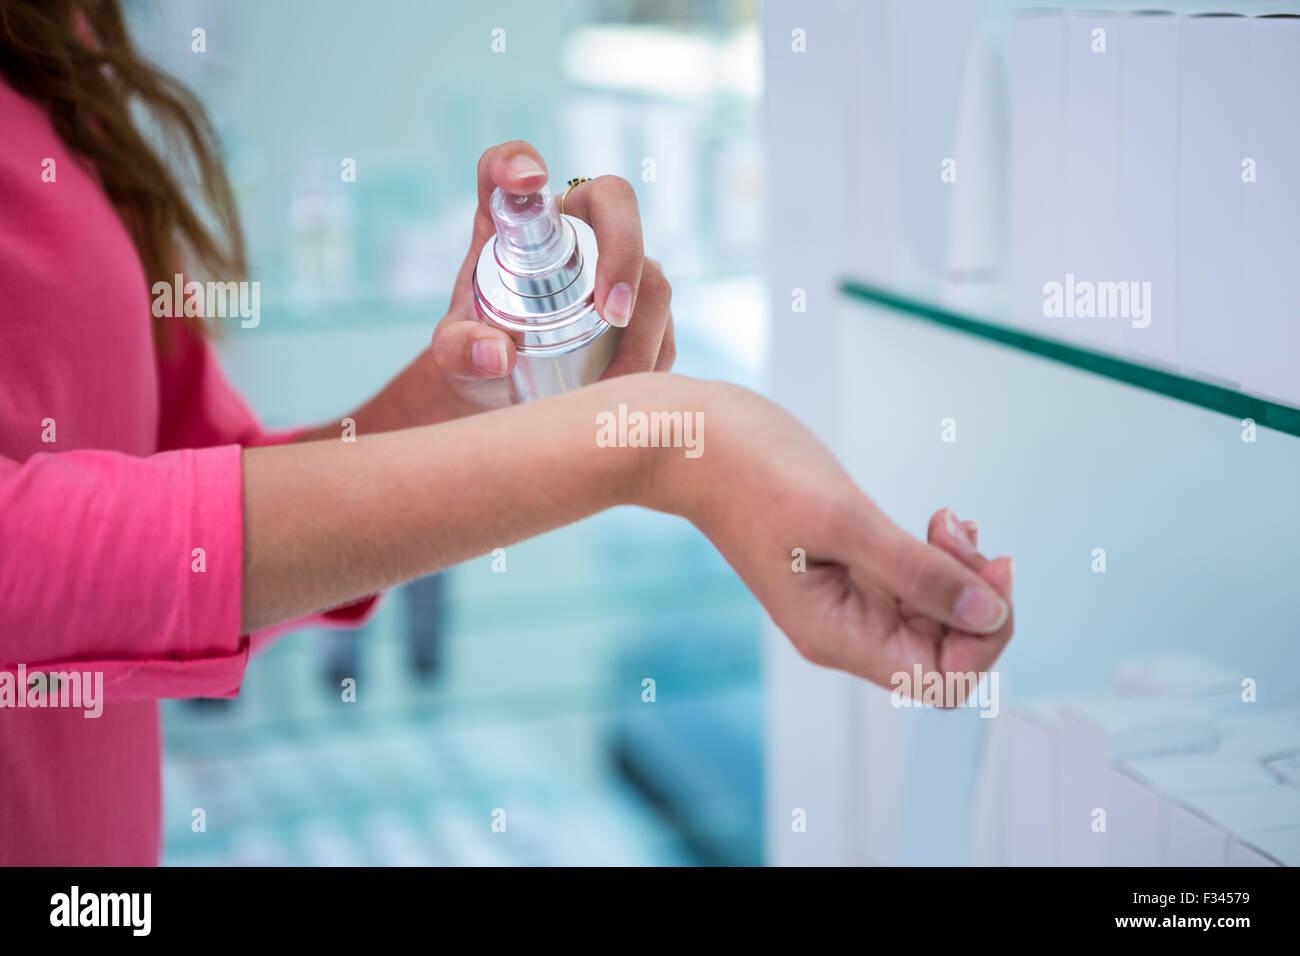 Woman spraying perfume on her wrist - Stock Image